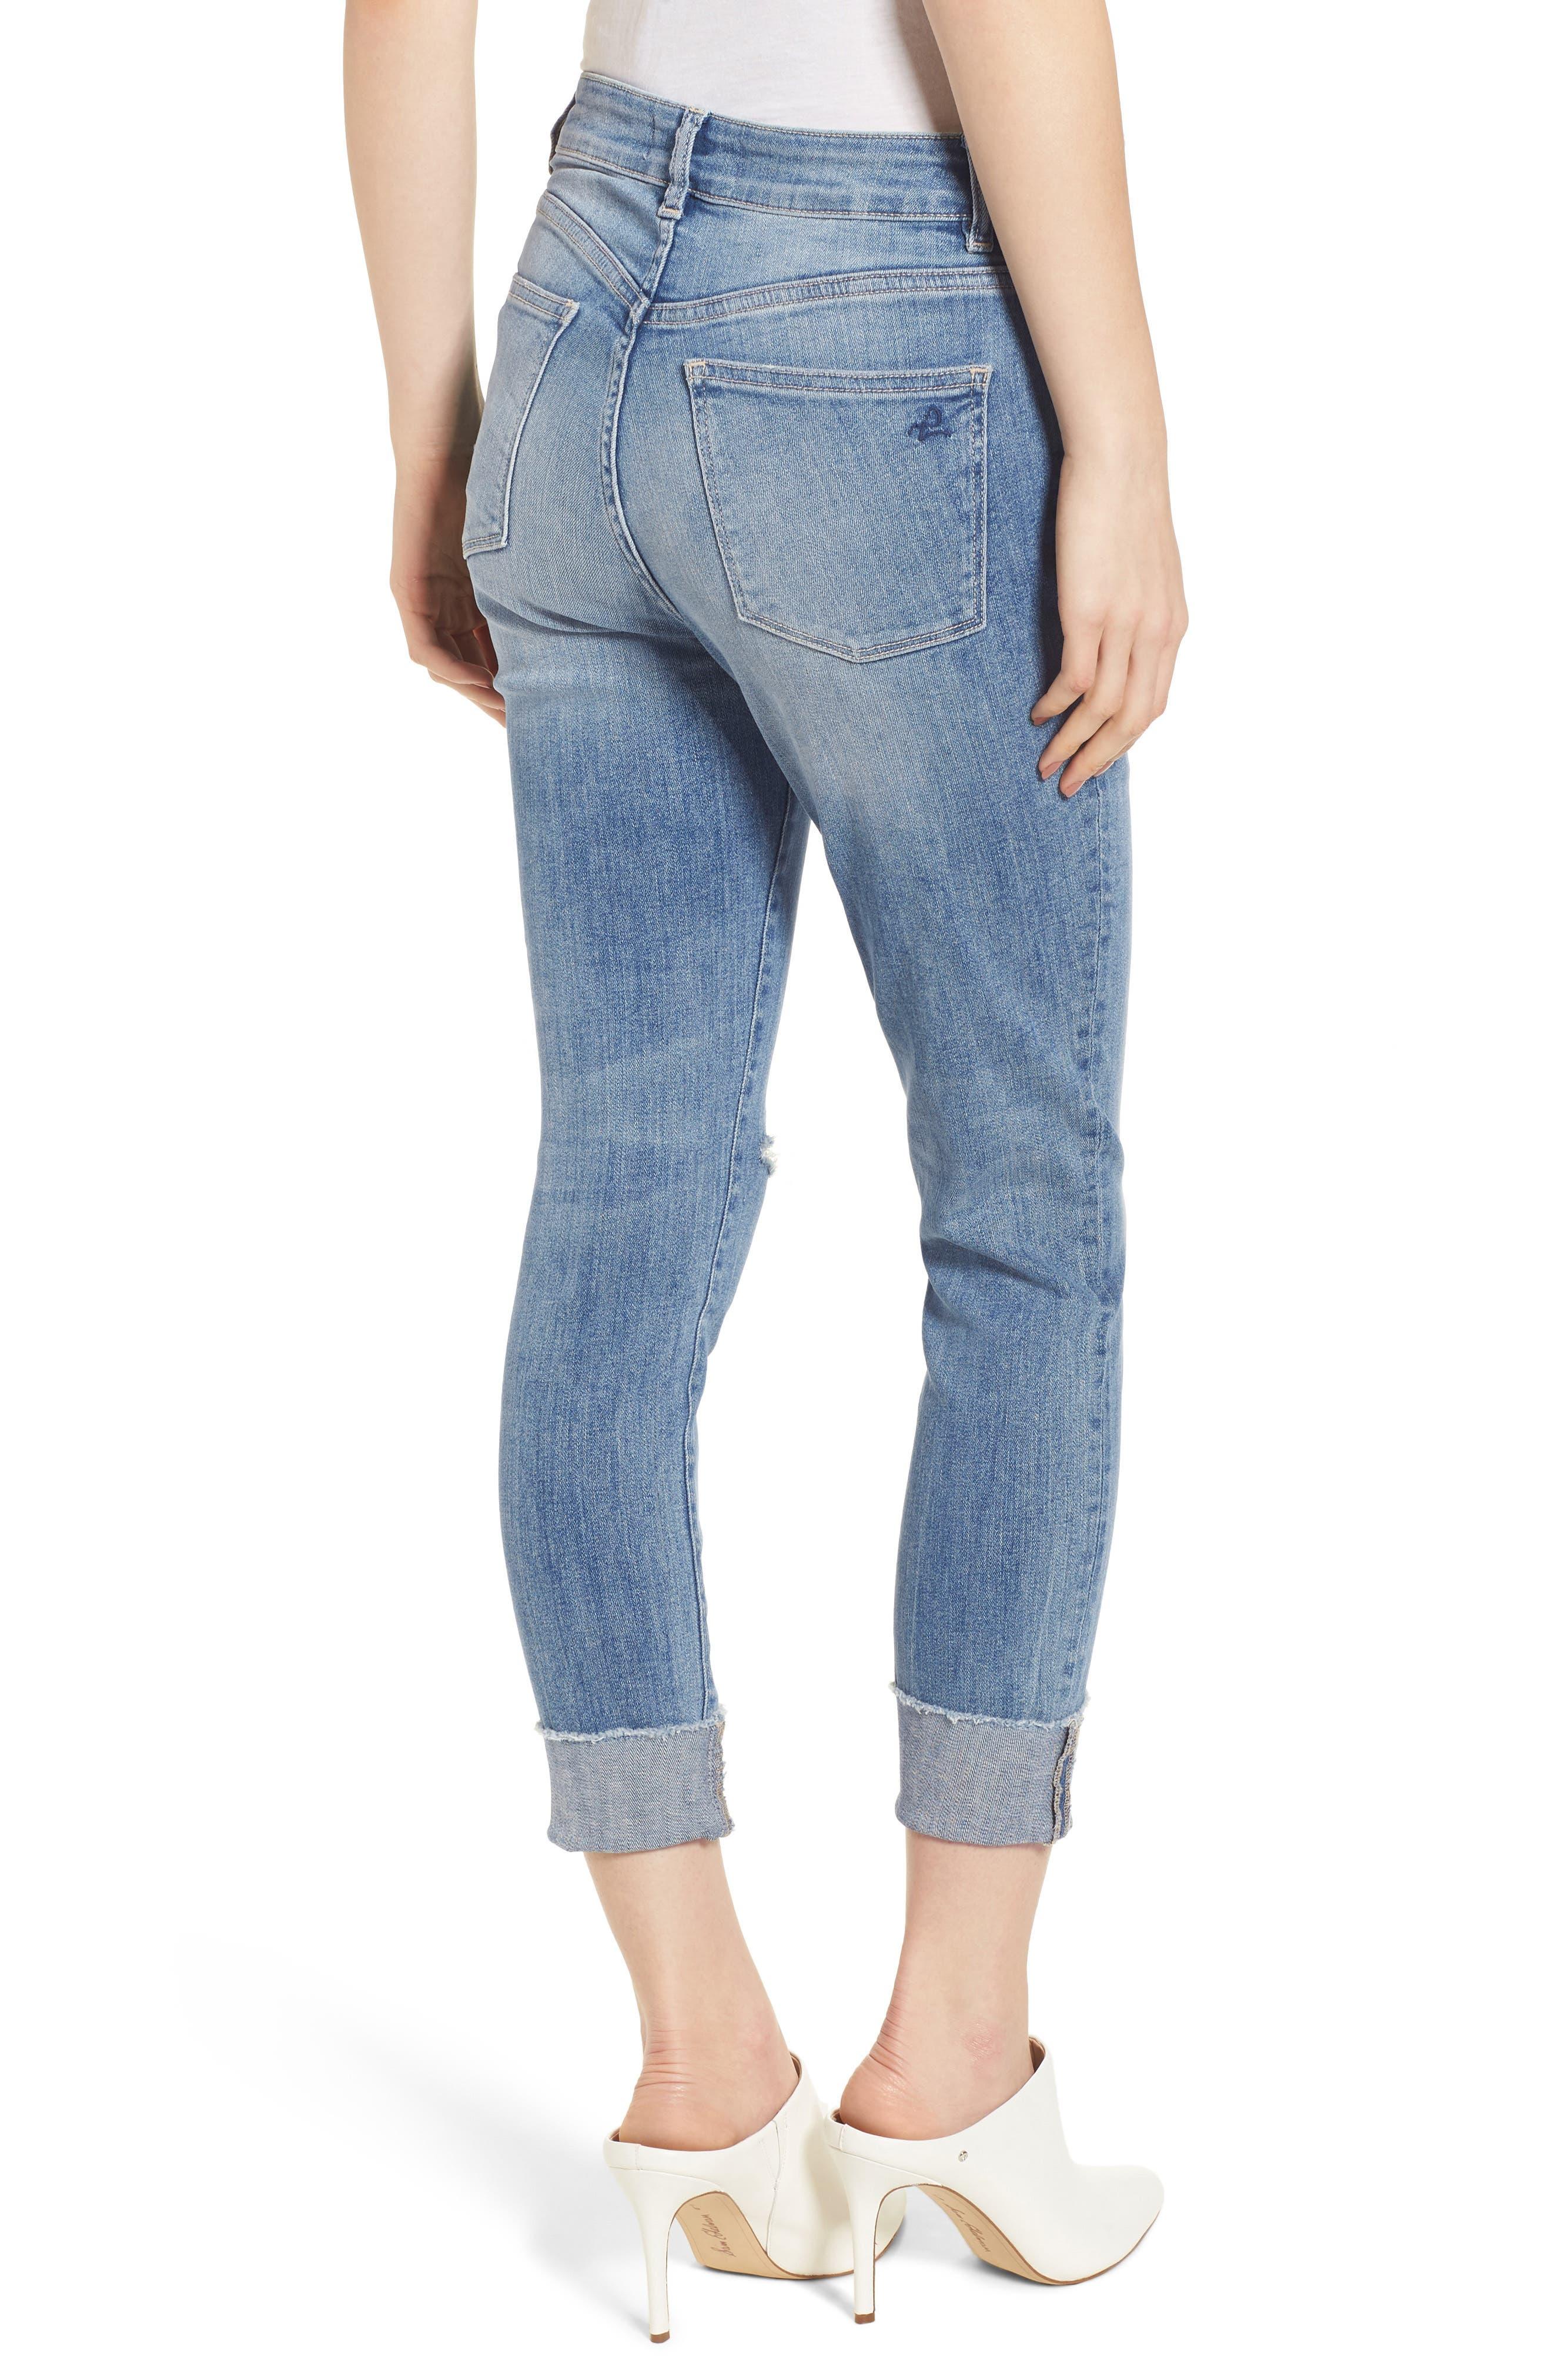 Farrow Instaslim High Waist Ankle Skinny Jeans,                             Alternate thumbnail 2, color,                             429